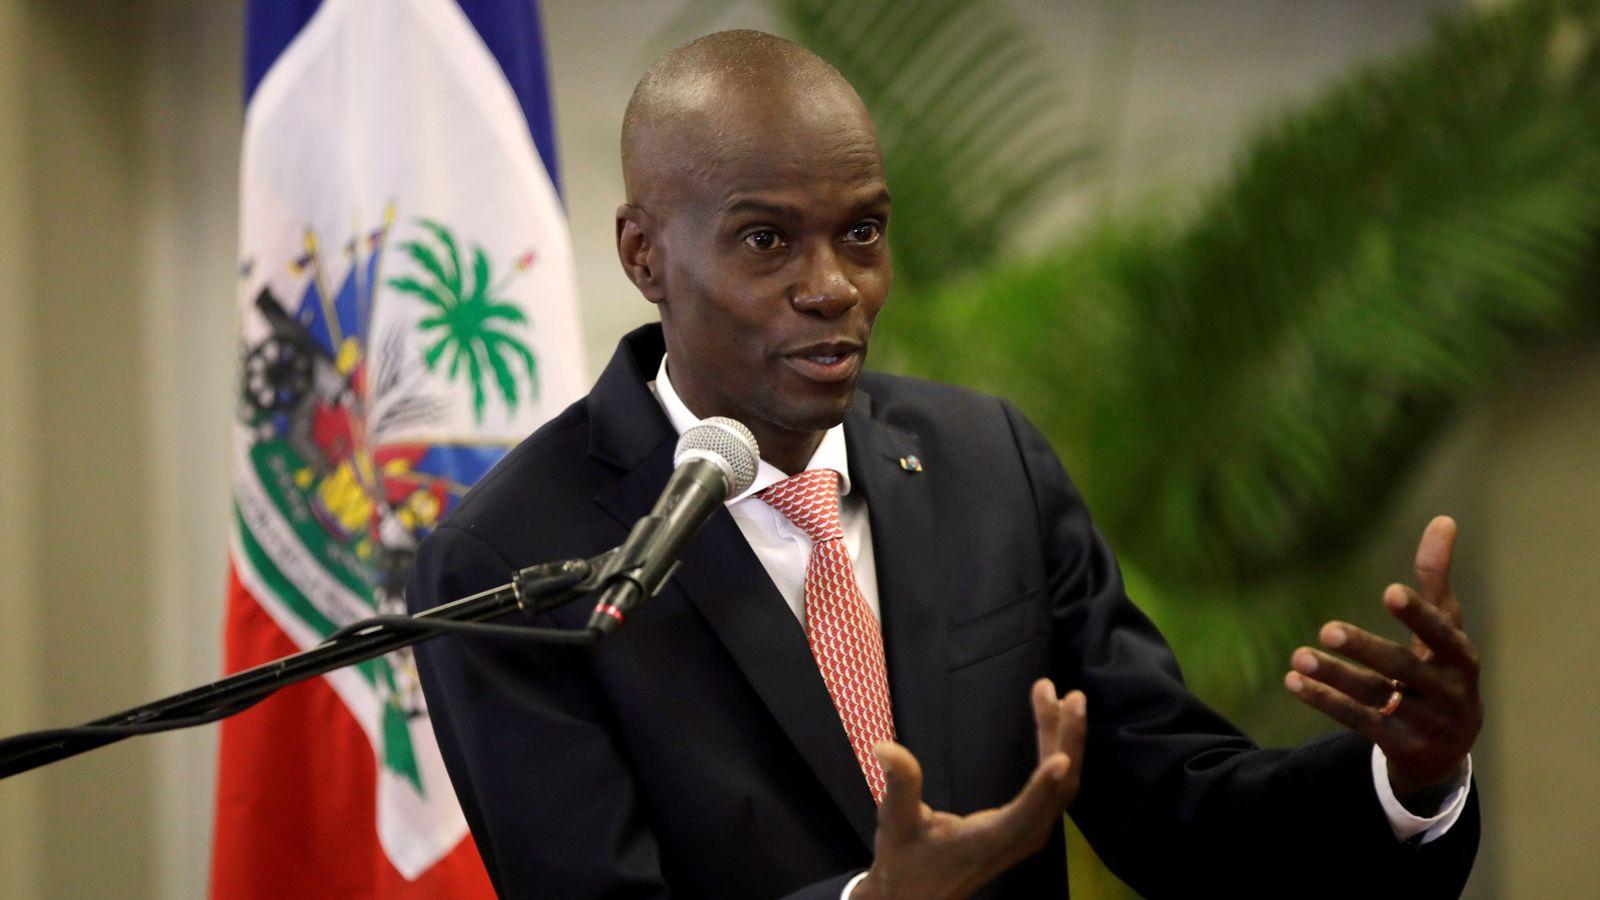 Tổng thống Haiti Jovenel Moise Port-au-Prince tháng 3/2020. Ảnh: Reuters.